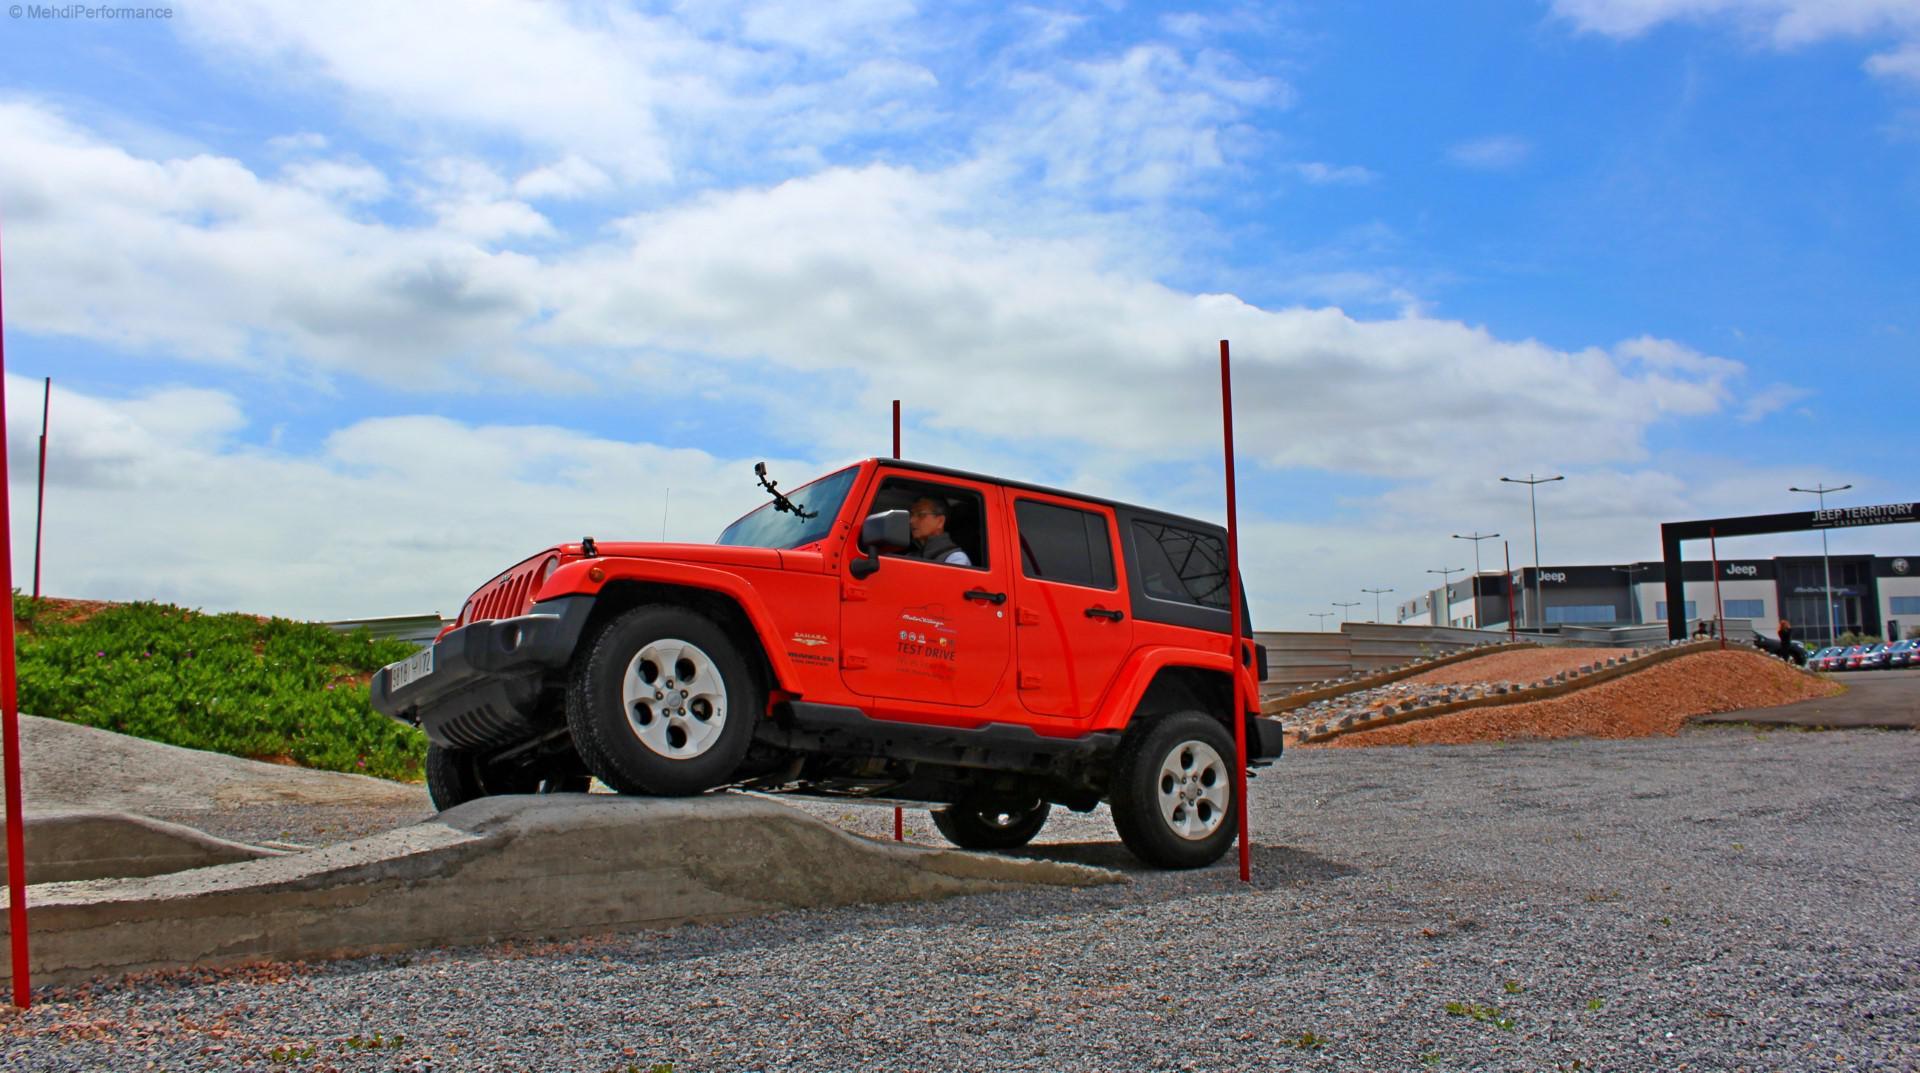 jeep-territory-le-nouveau-terrain-de-jeu-by-motor-village-716-9.jpg